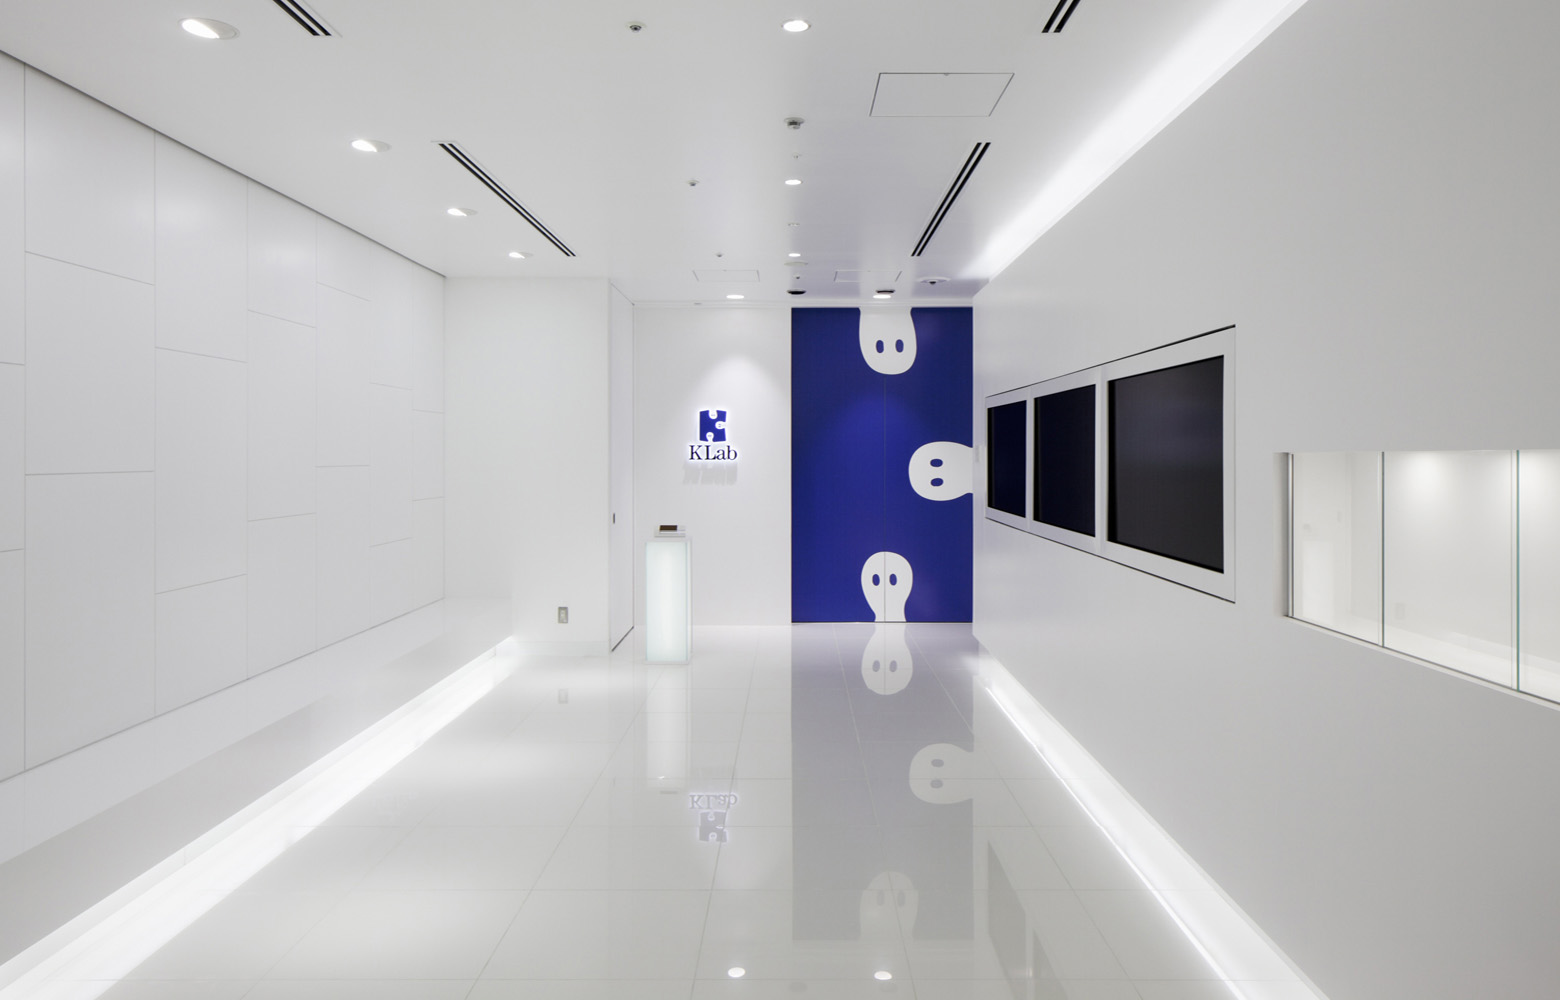 KLab株式会社 Entrance デザイン・レイアウト事例